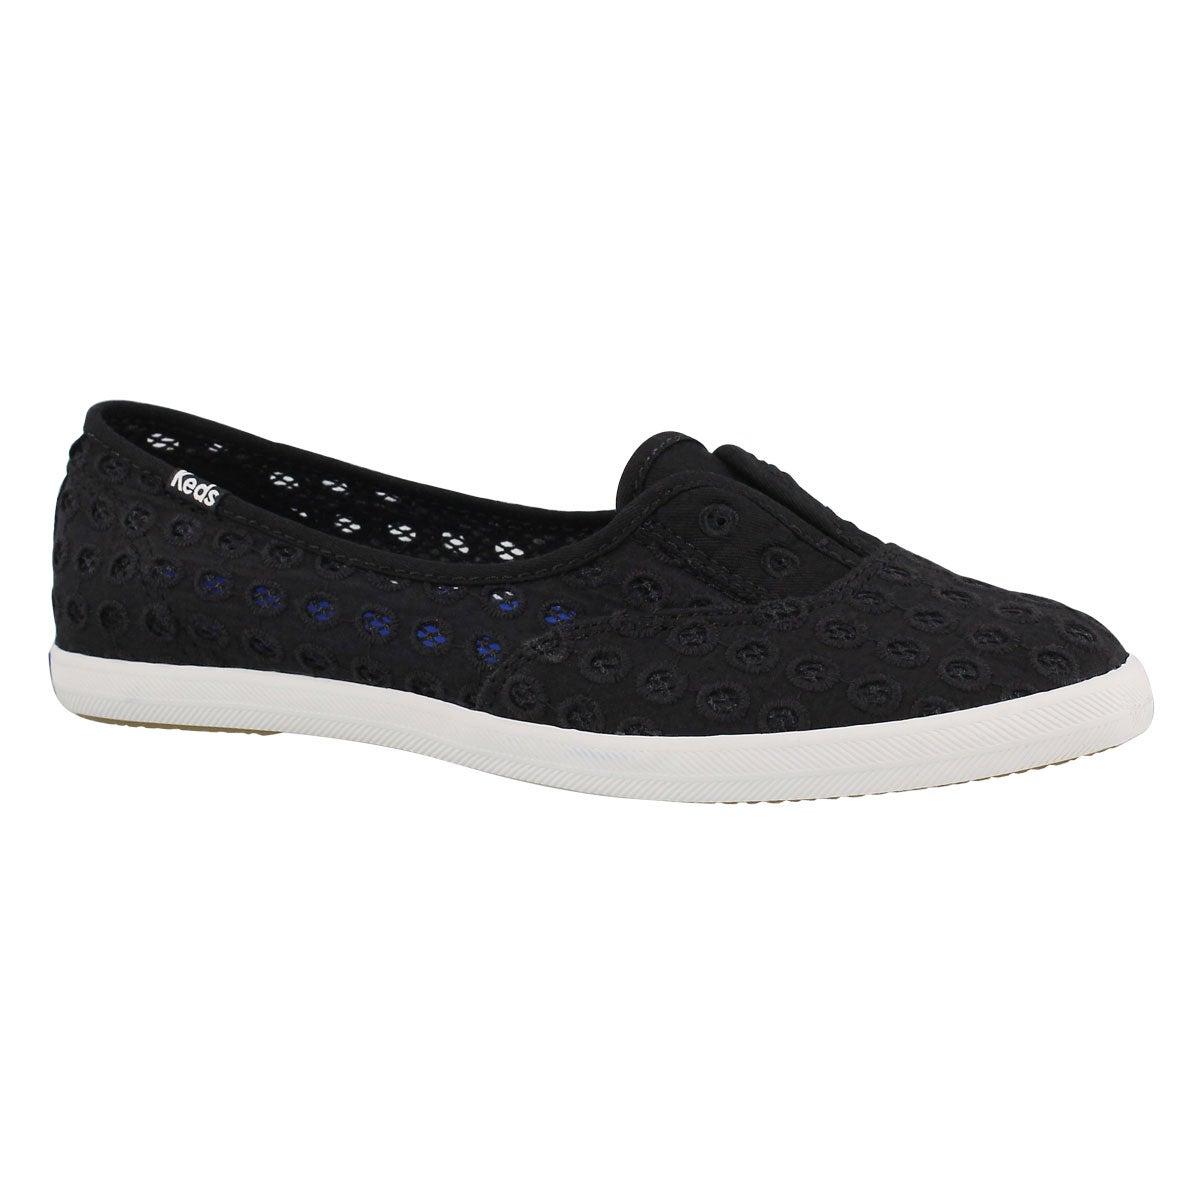 Women's CHILLAX MINI EYELET blk fashion sneakers